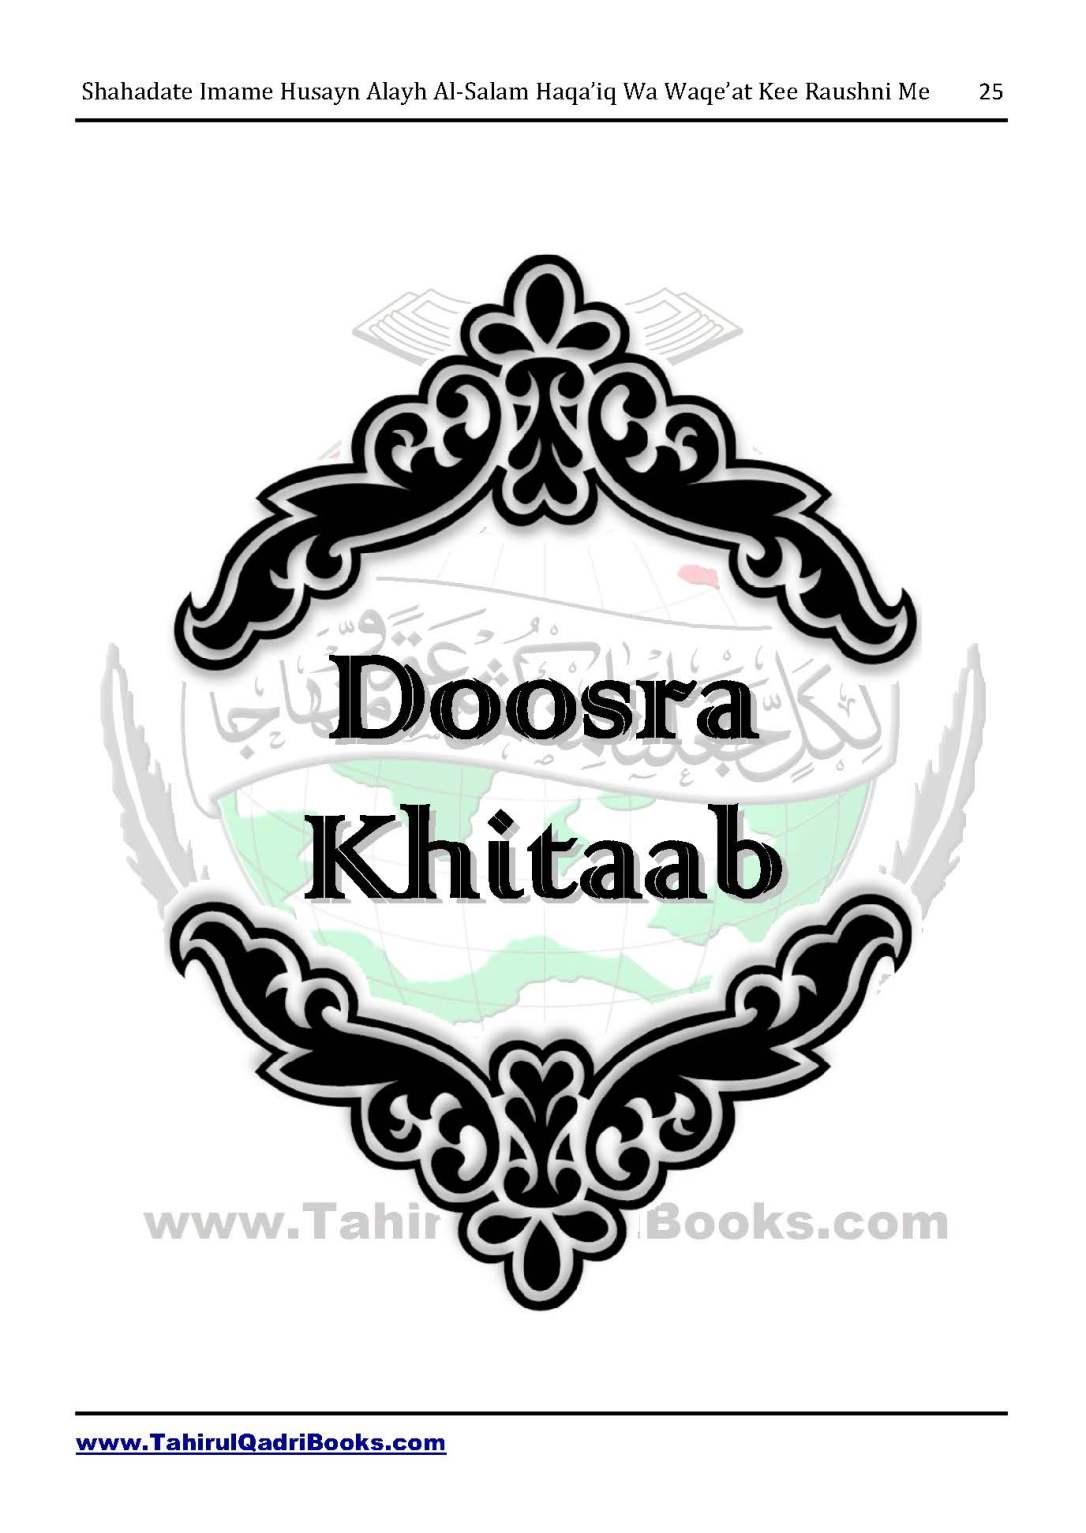 shahadate-imame-husayn-alayh-is-salam-haqaiq-wa-waqe_at-kee-raushni-me-in-roman-urdu-unlocked_Page_25